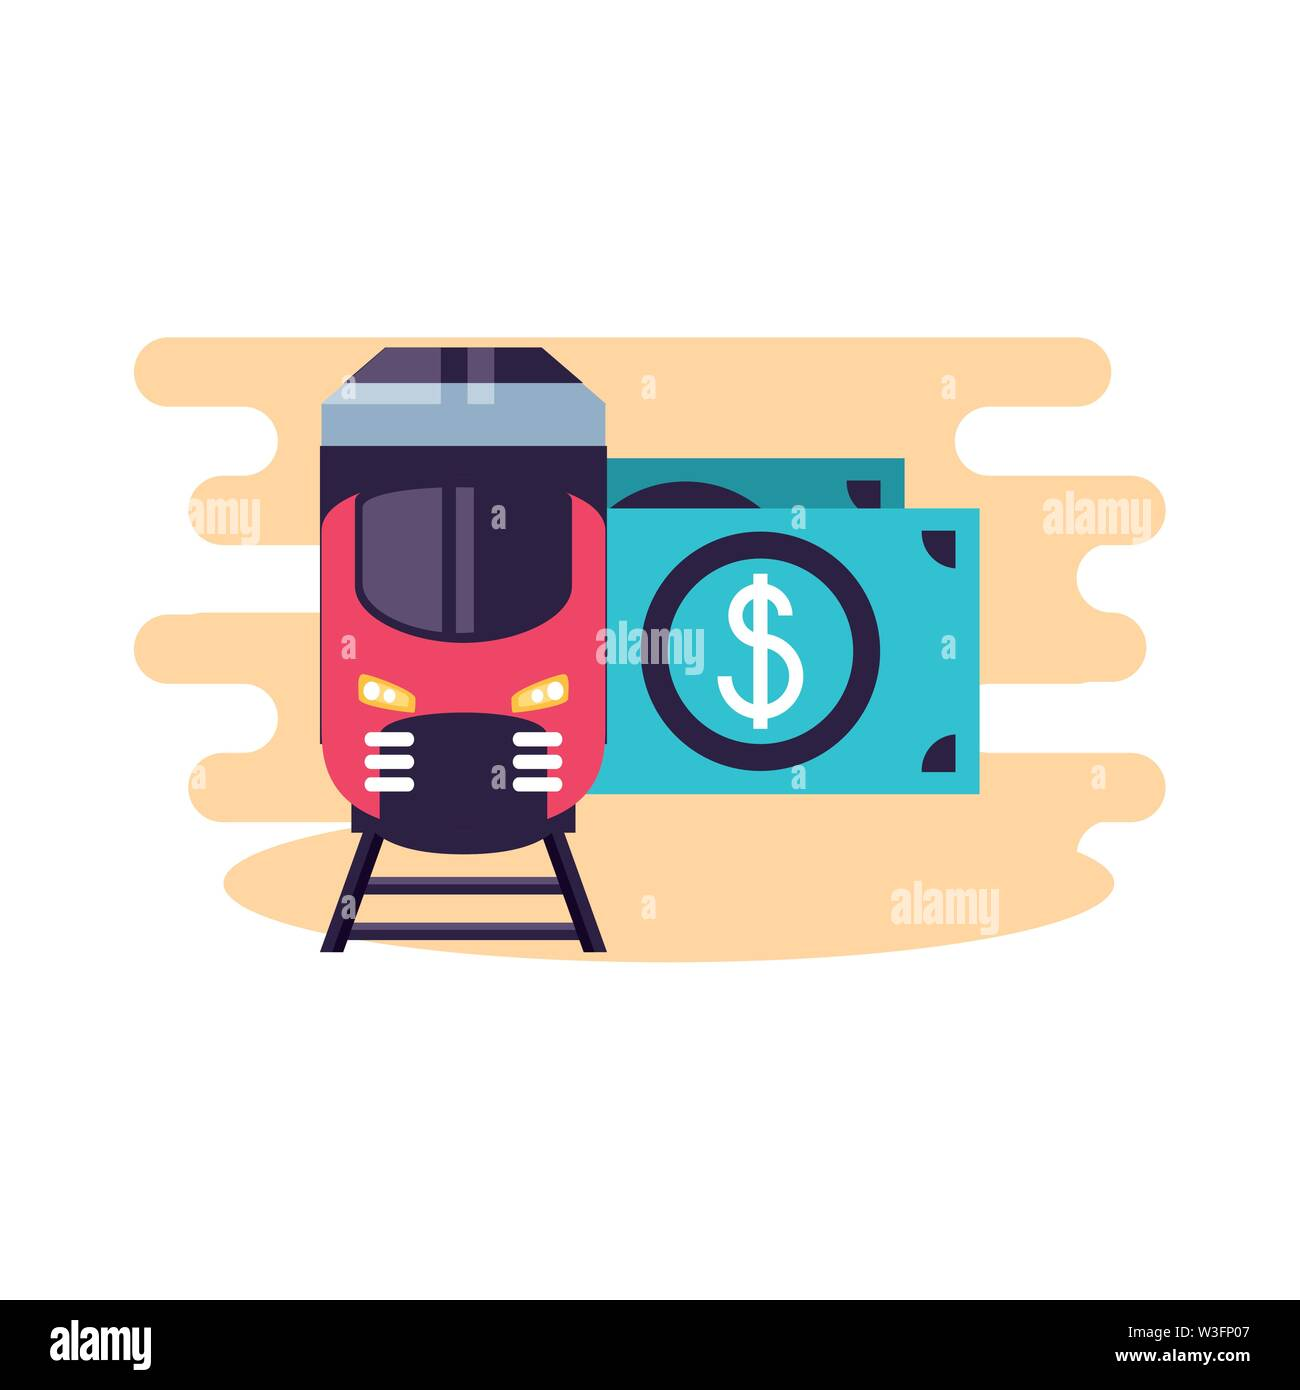 train travel vehicle with bills dollars vector illustration design - Stock Image